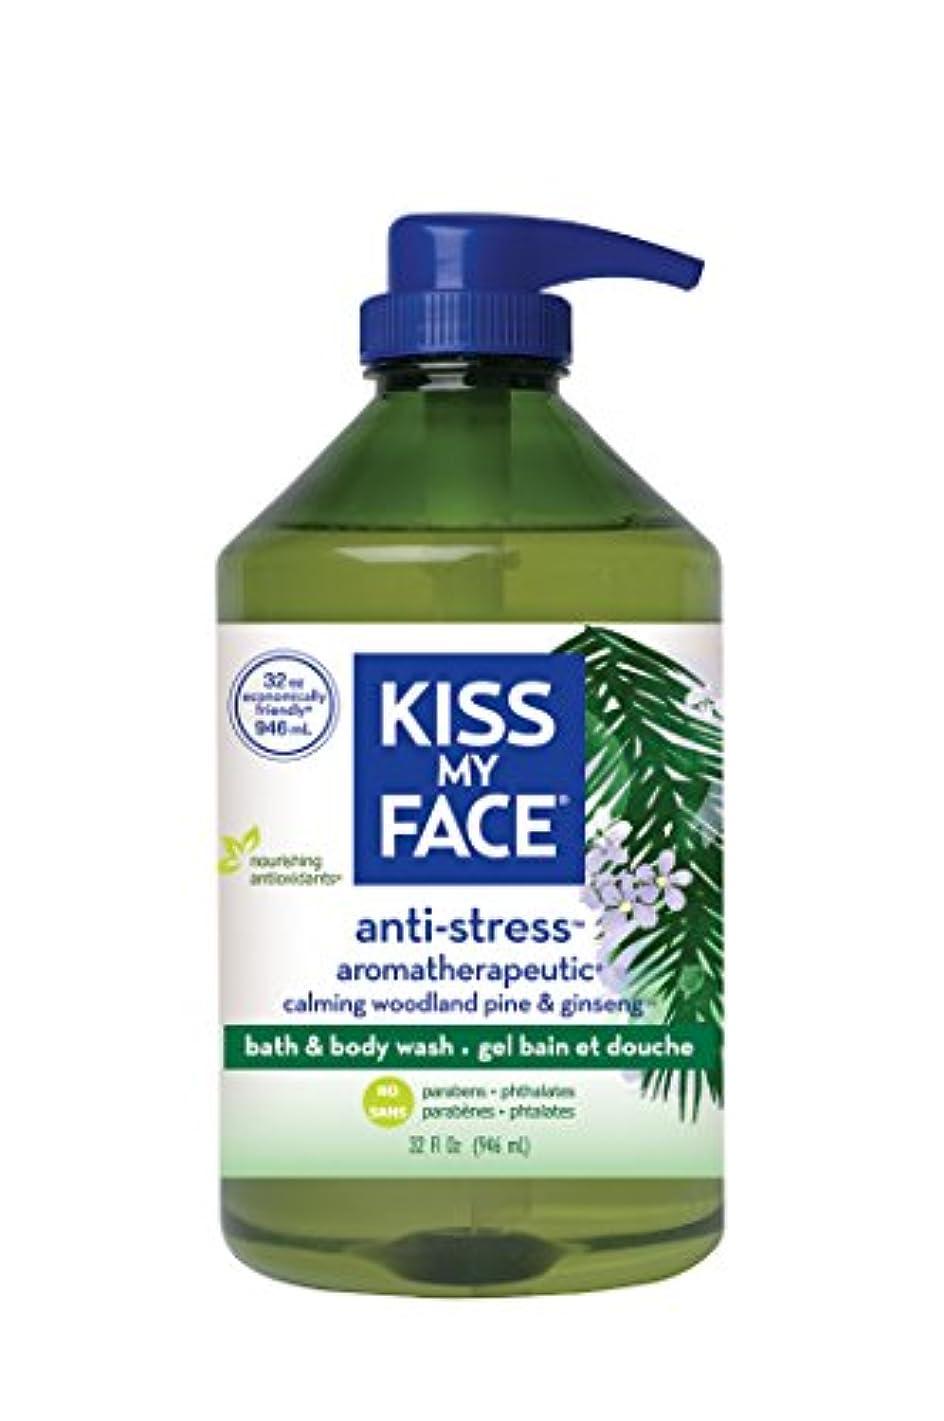 ラリー彼女自身荷物海外直送品Kiss My Face Anti-Stress Shower Gel, 32 oz